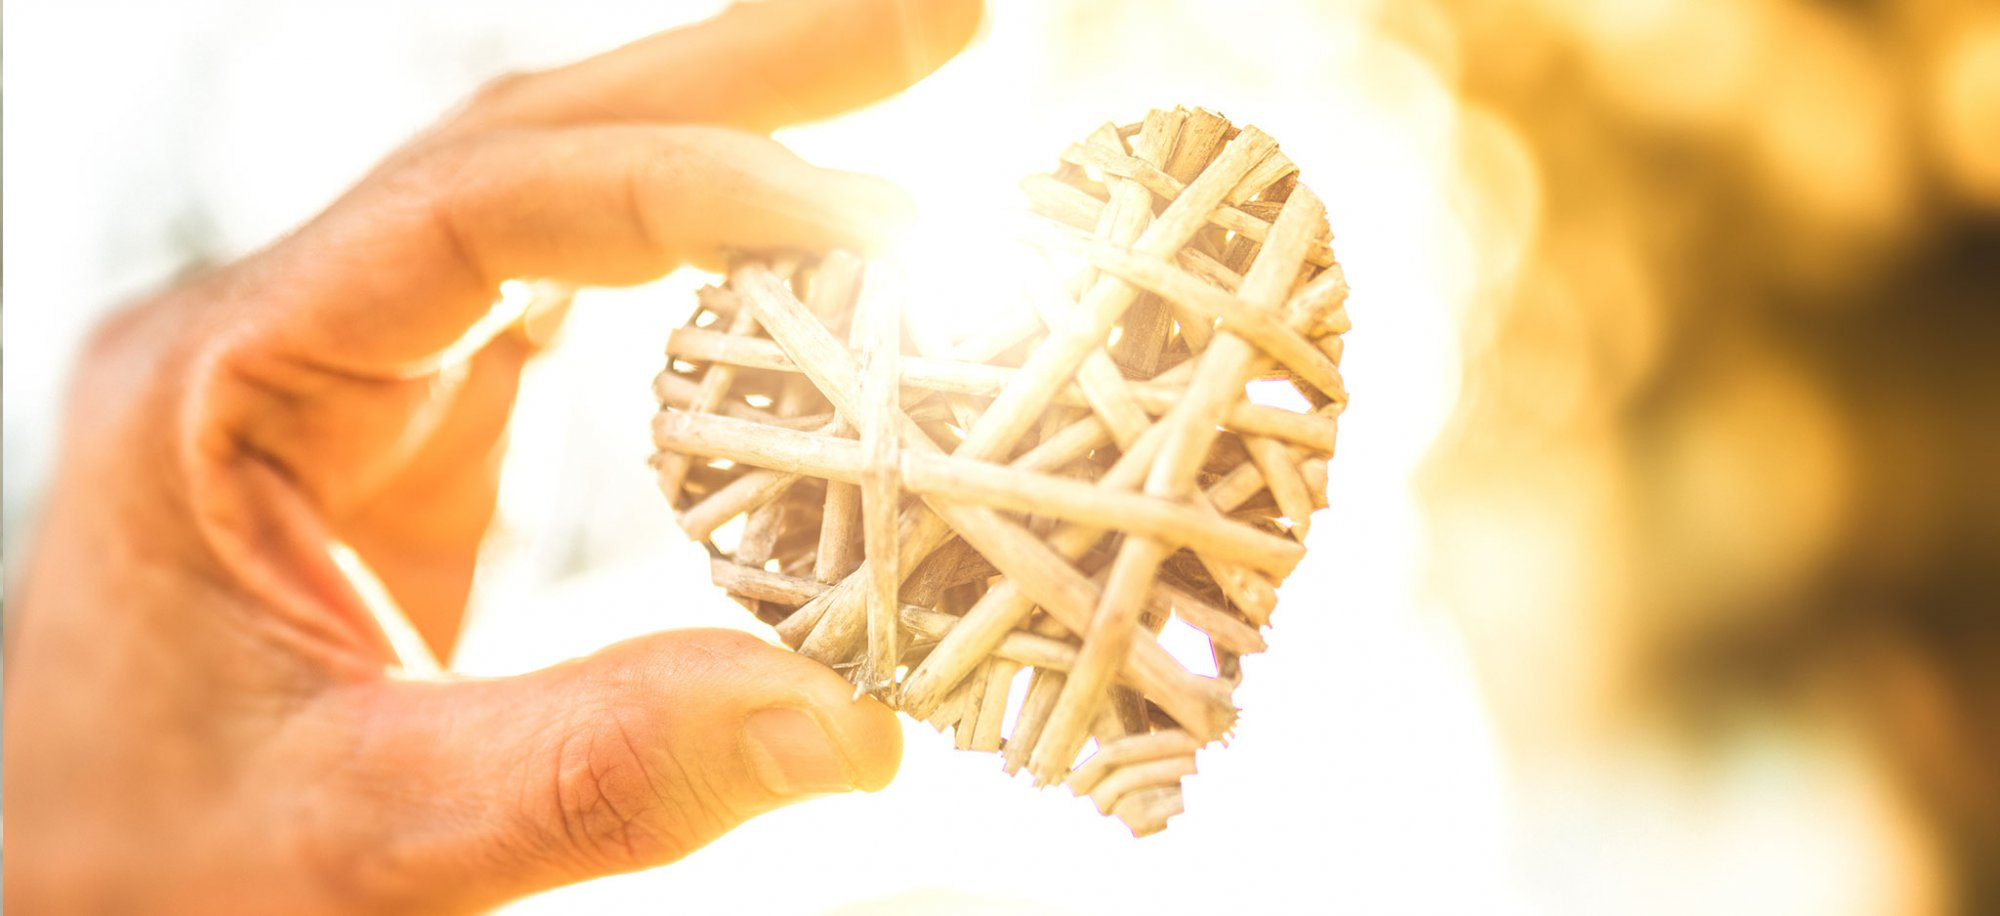 A hand holds a wooden woven heart